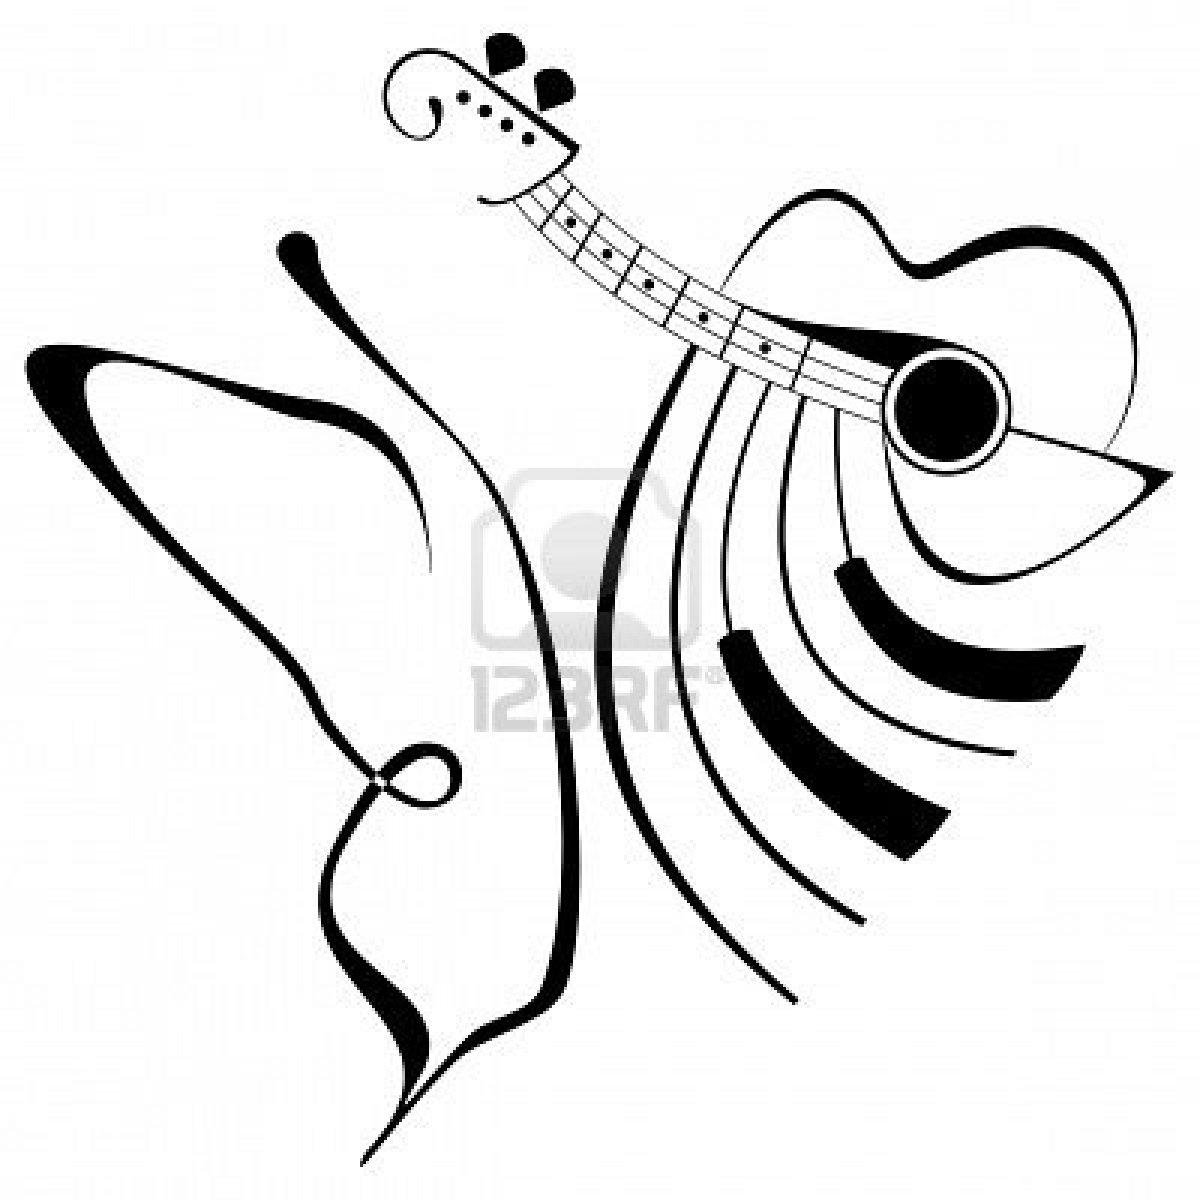 http://4.bp.blogspot.com/-se6dzXk1JYQ/UKGbDp4VcmI/AAAAAAAAAho/D5DfKZkJgVk/s1600/5197934-vector-de-composicion-abstracta-con-las-mariposas-guitarra-y-piano.jpg